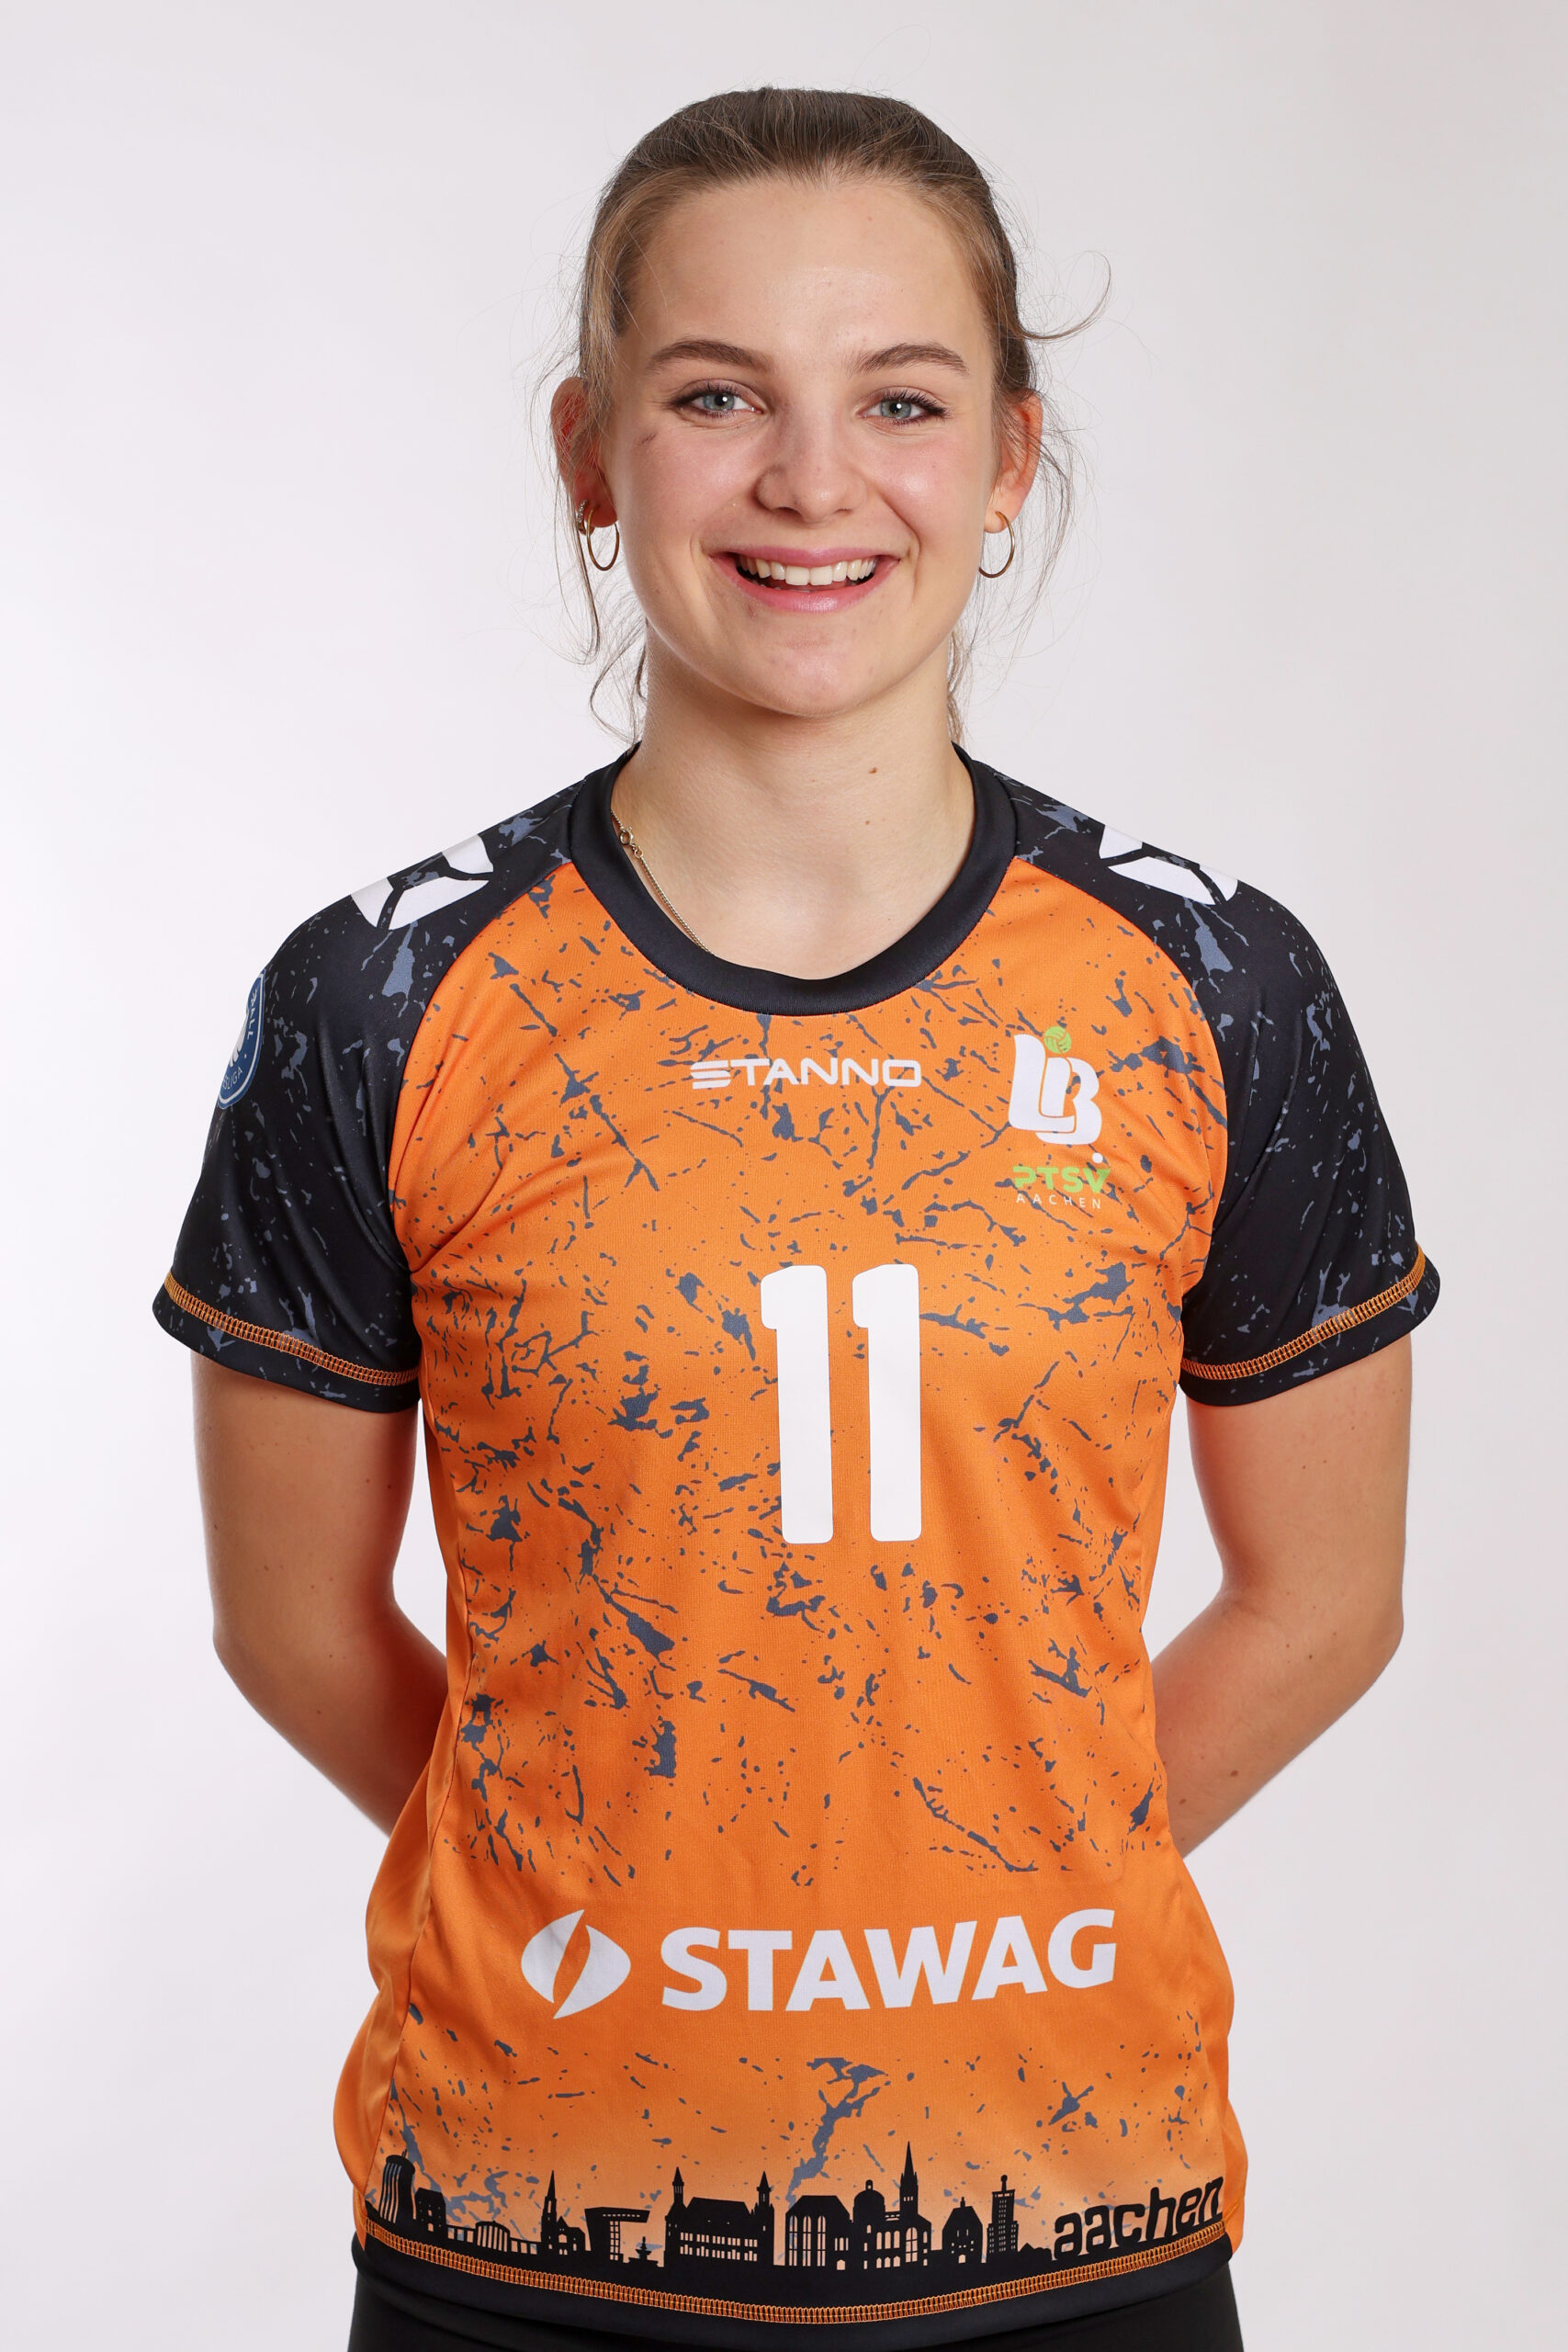 Maja Löcker